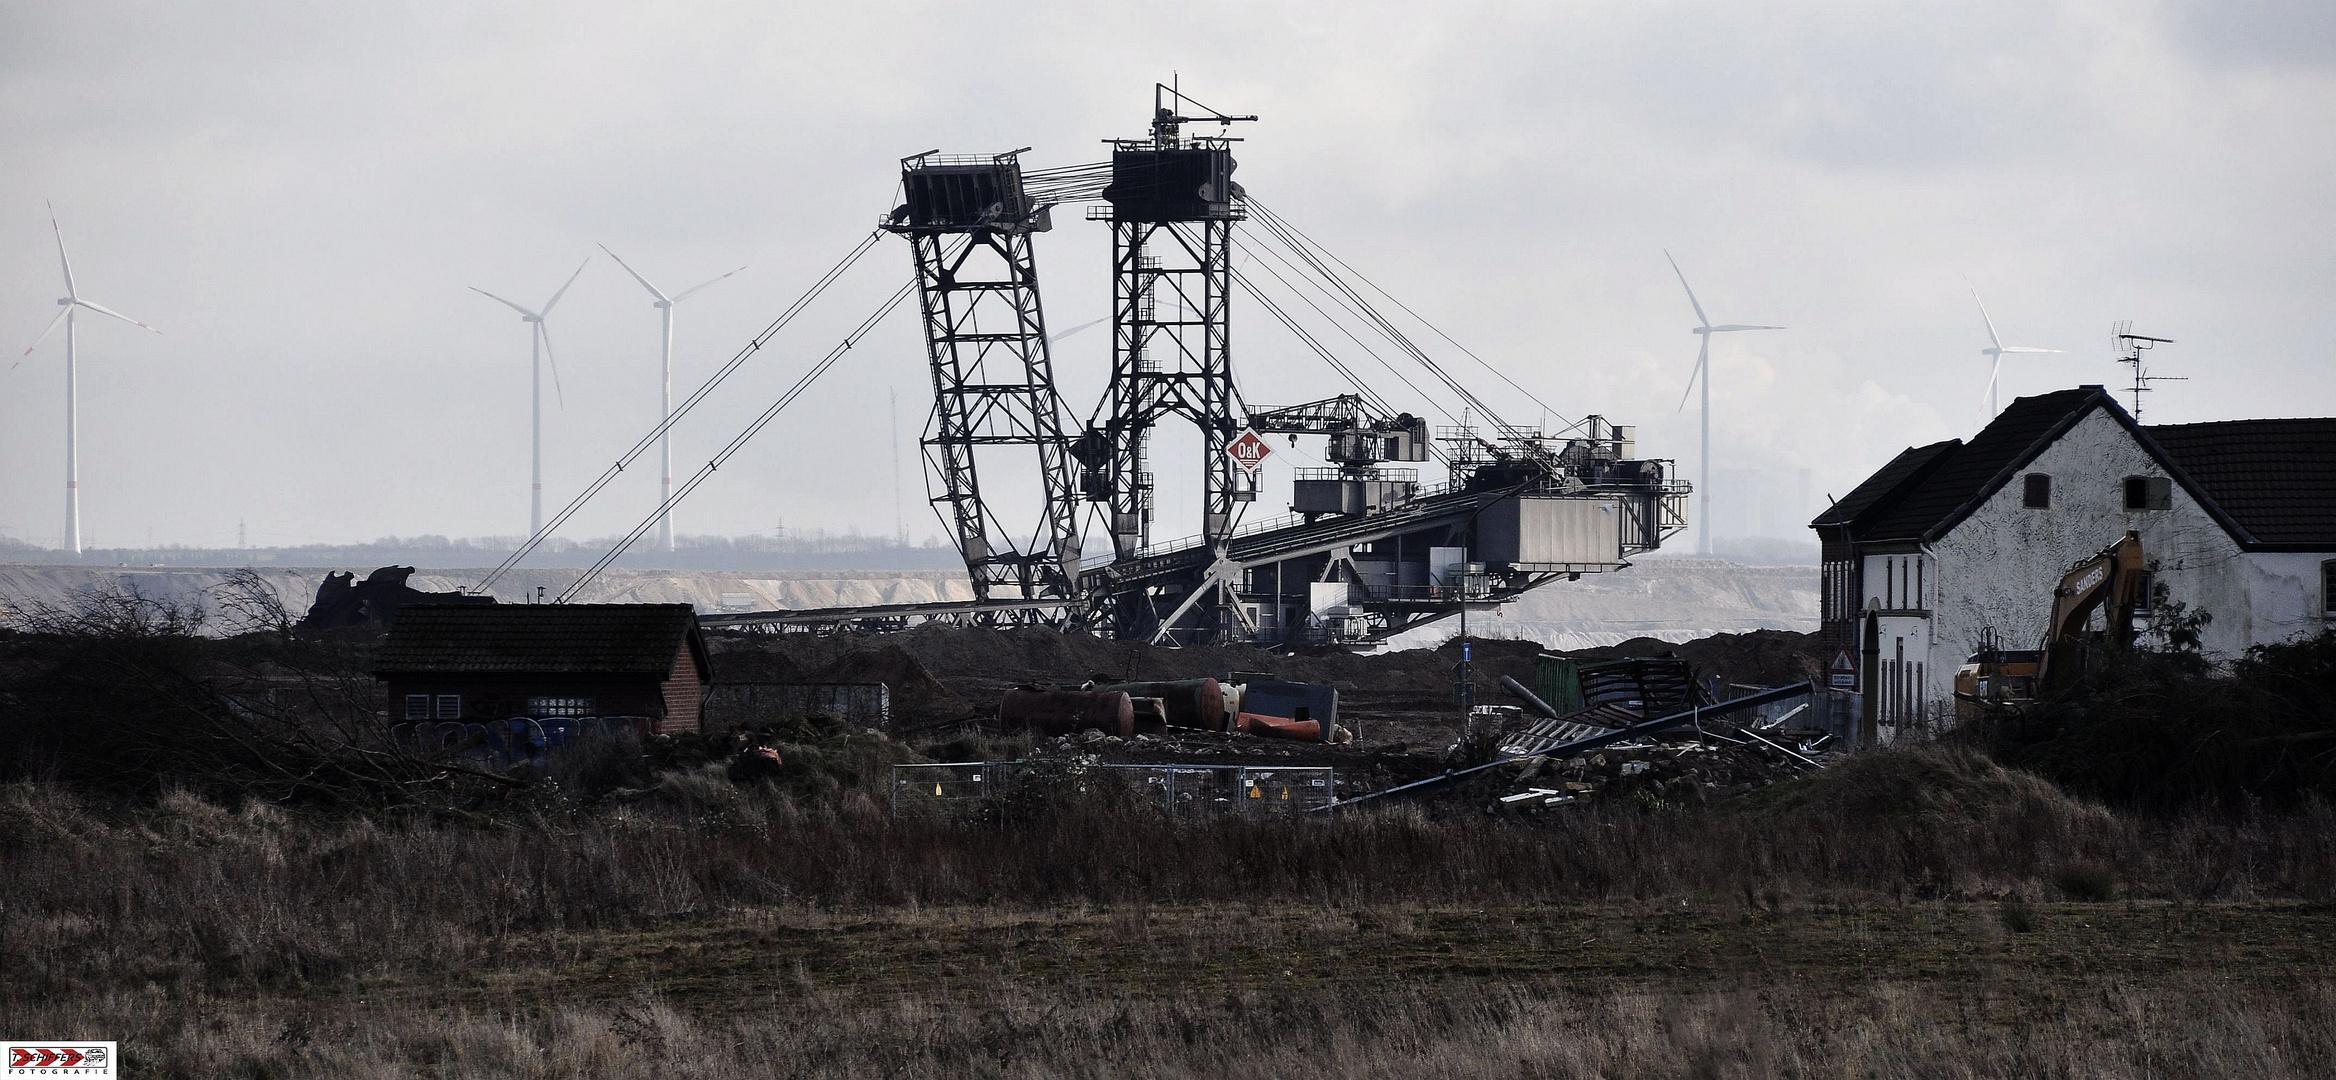 Windkraft vs. Kohleverstromung